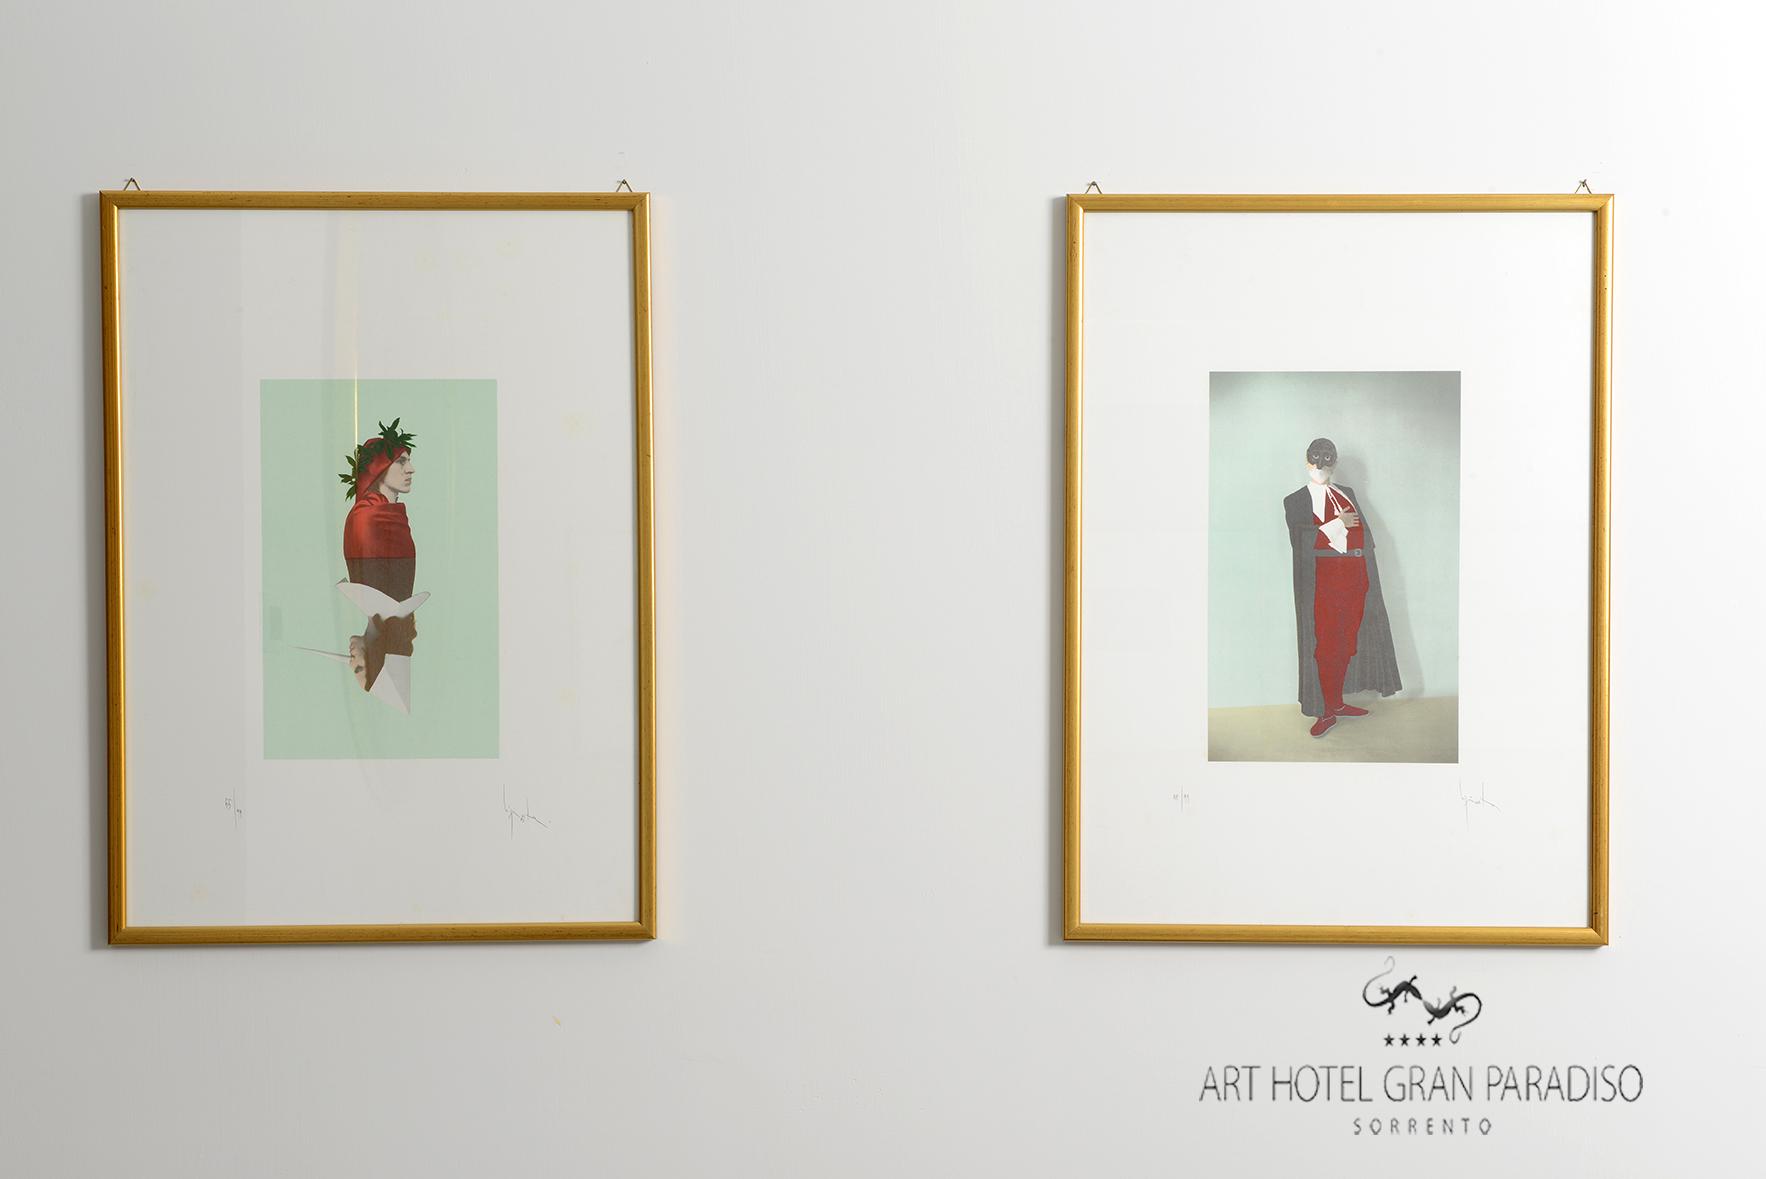 Art_Hotel_Gran_Paradiso_2013_411_Luigi_Ontani_5.jpg